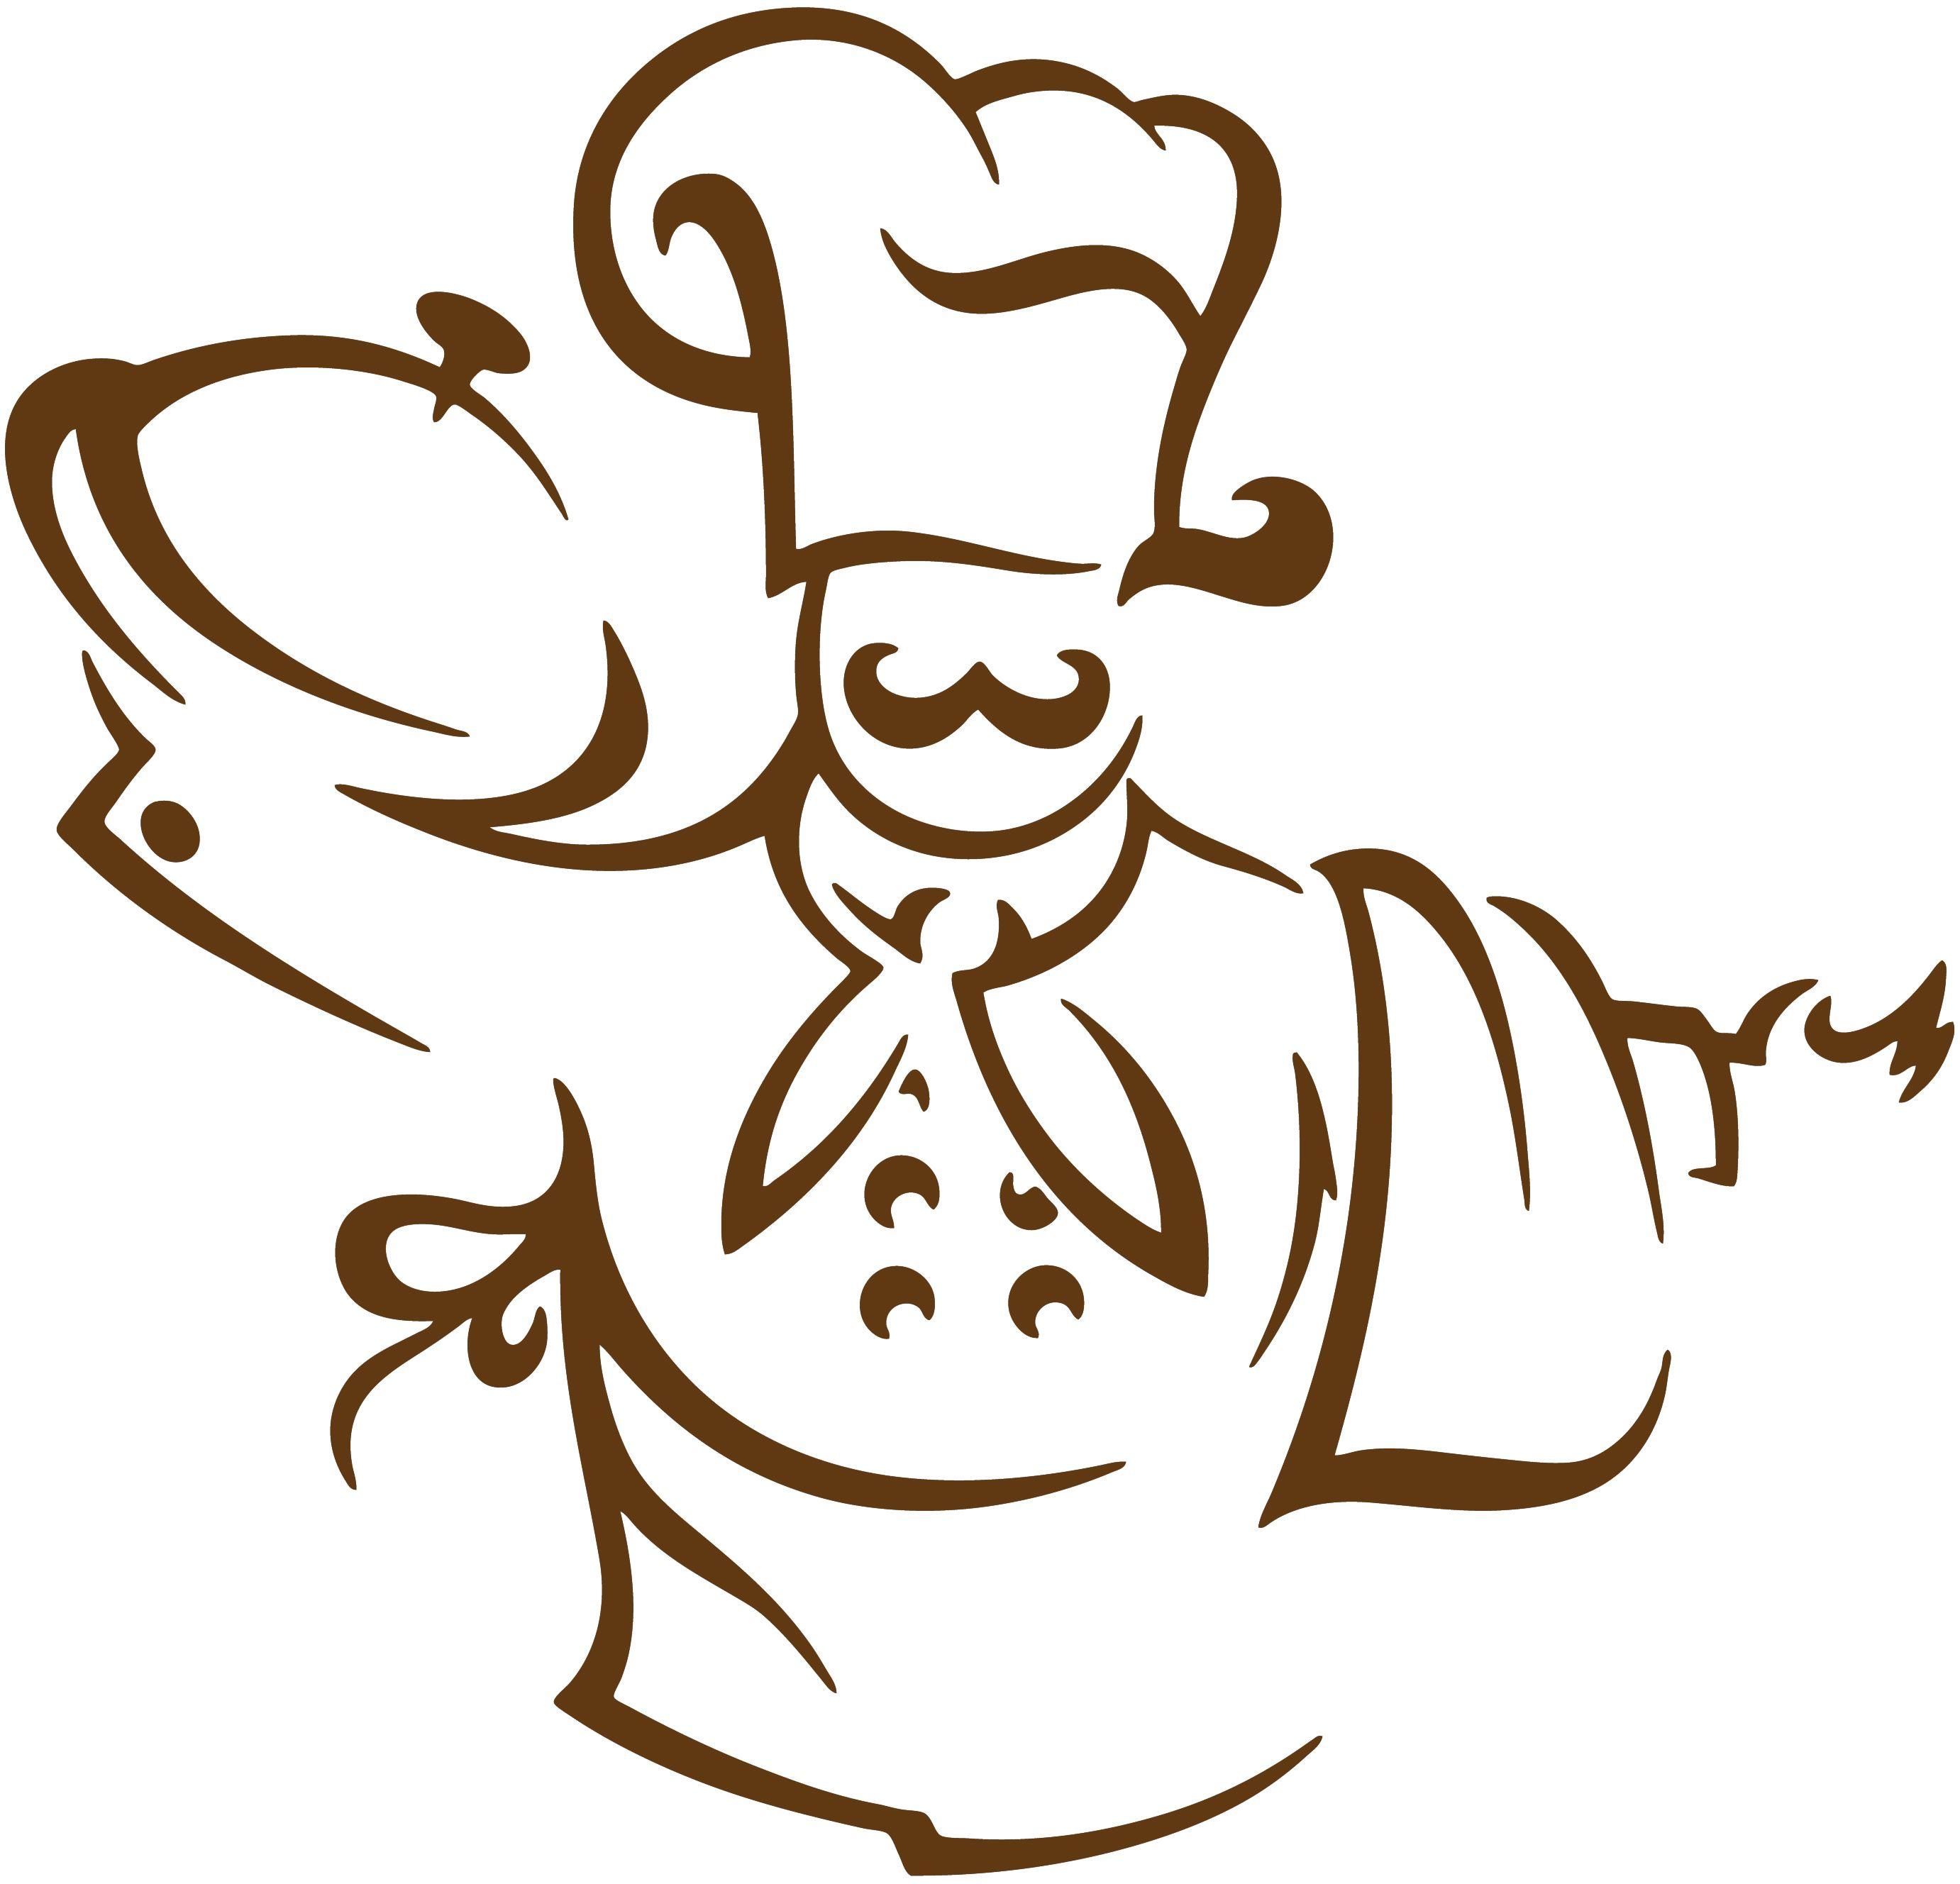 Sticker Cuisine Chef Avec Soupi Re Cocina